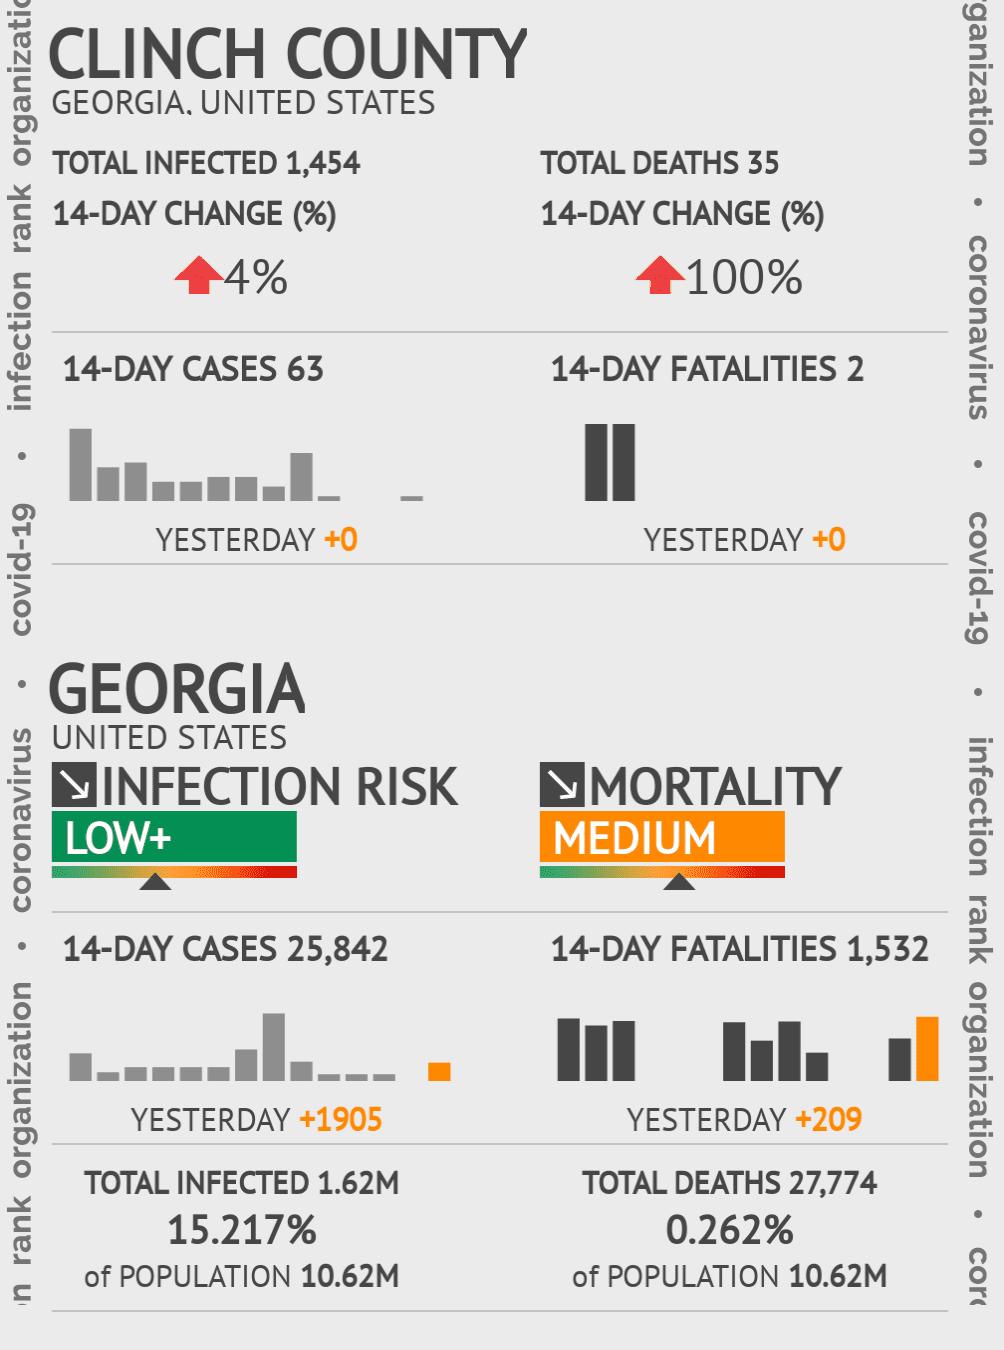 Clinch County Coronavirus Covid-19 Risk of Infection on November 29, 2020